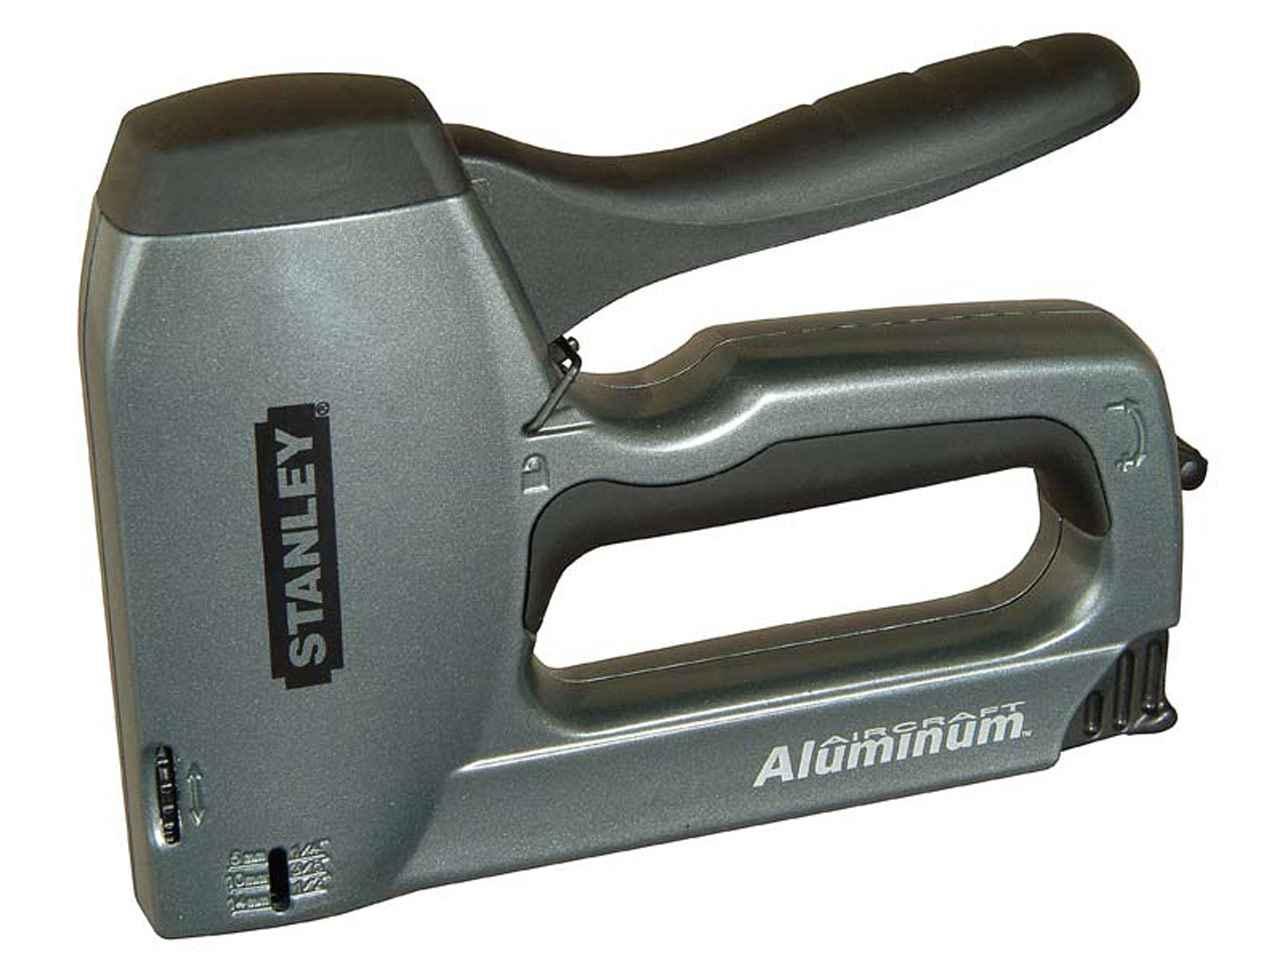 Trade Pack HH0100106320 Z1-140 Staple Gun Rapesco